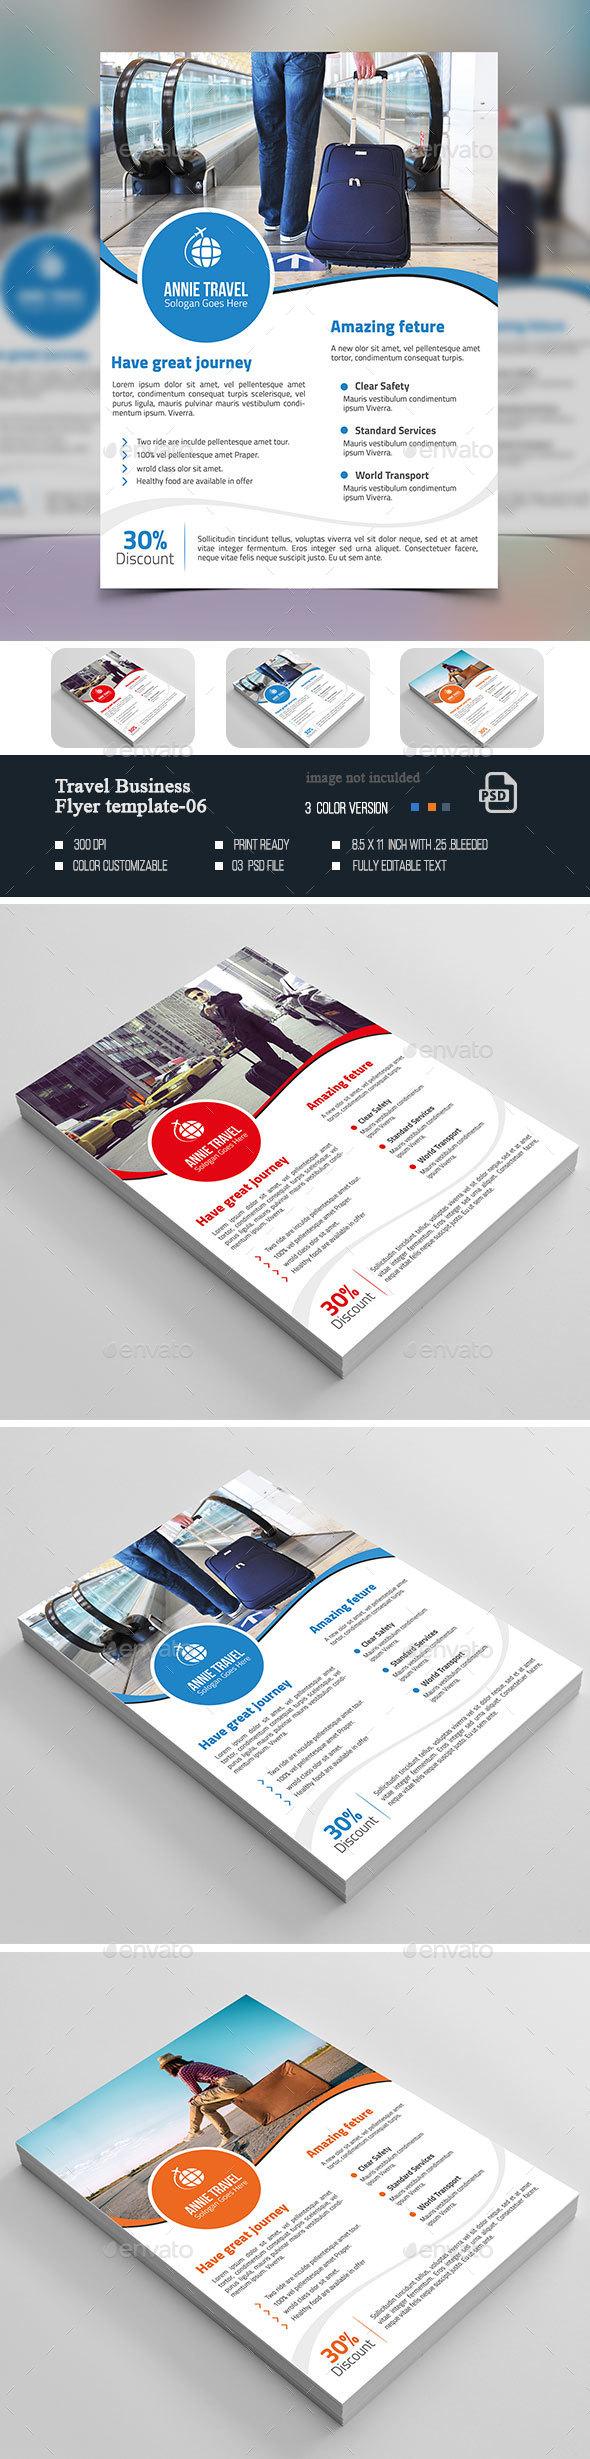 Travel Agency Flyer-06 - Flyers Print Templates